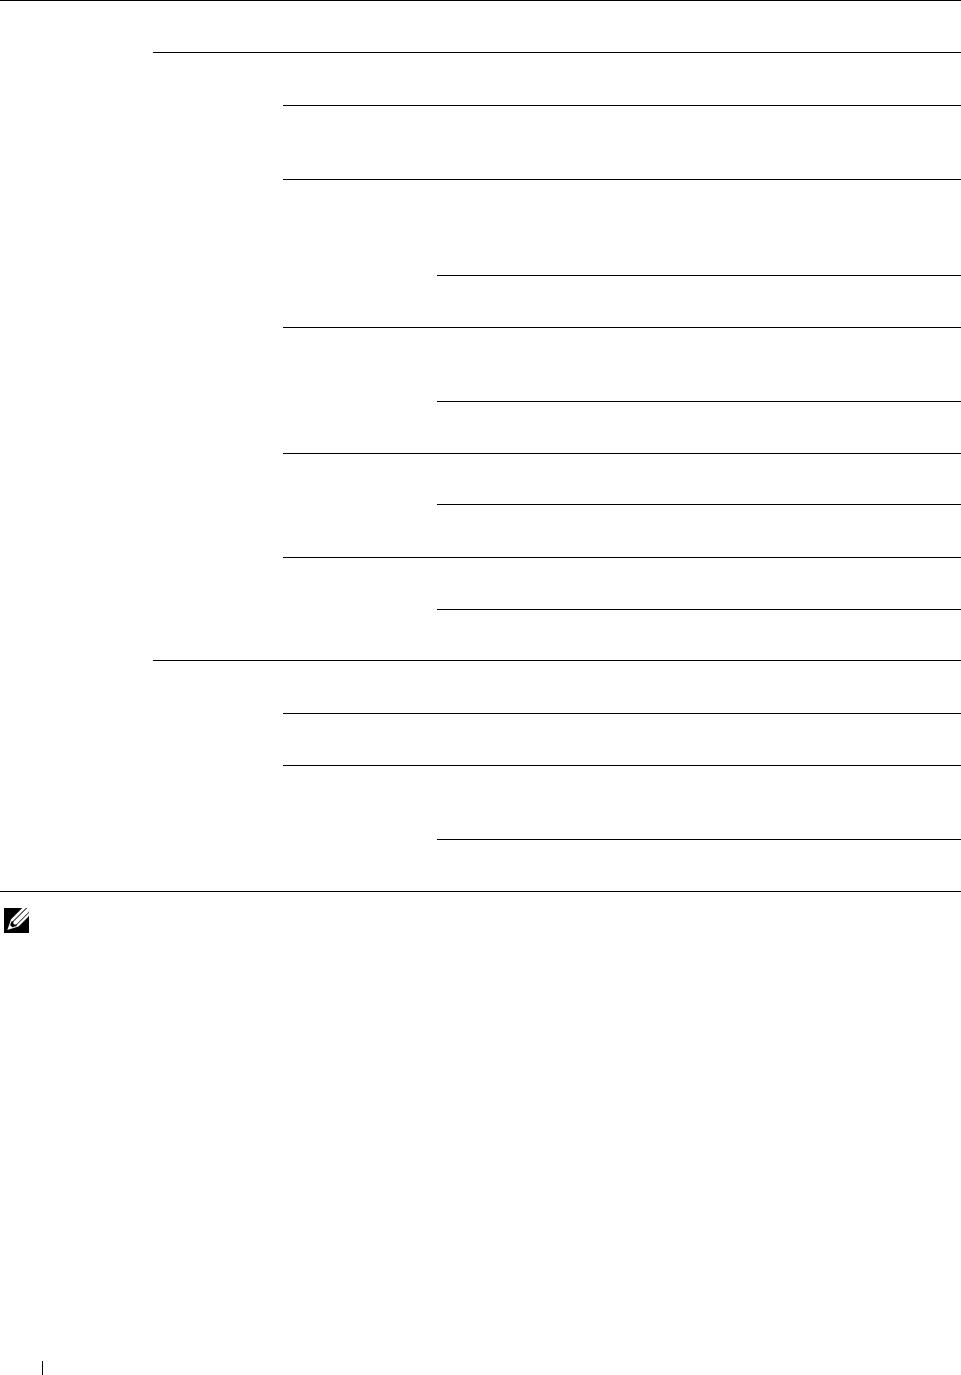 Handleiding Dell C1760nw (pagina 130 van 240) (English)